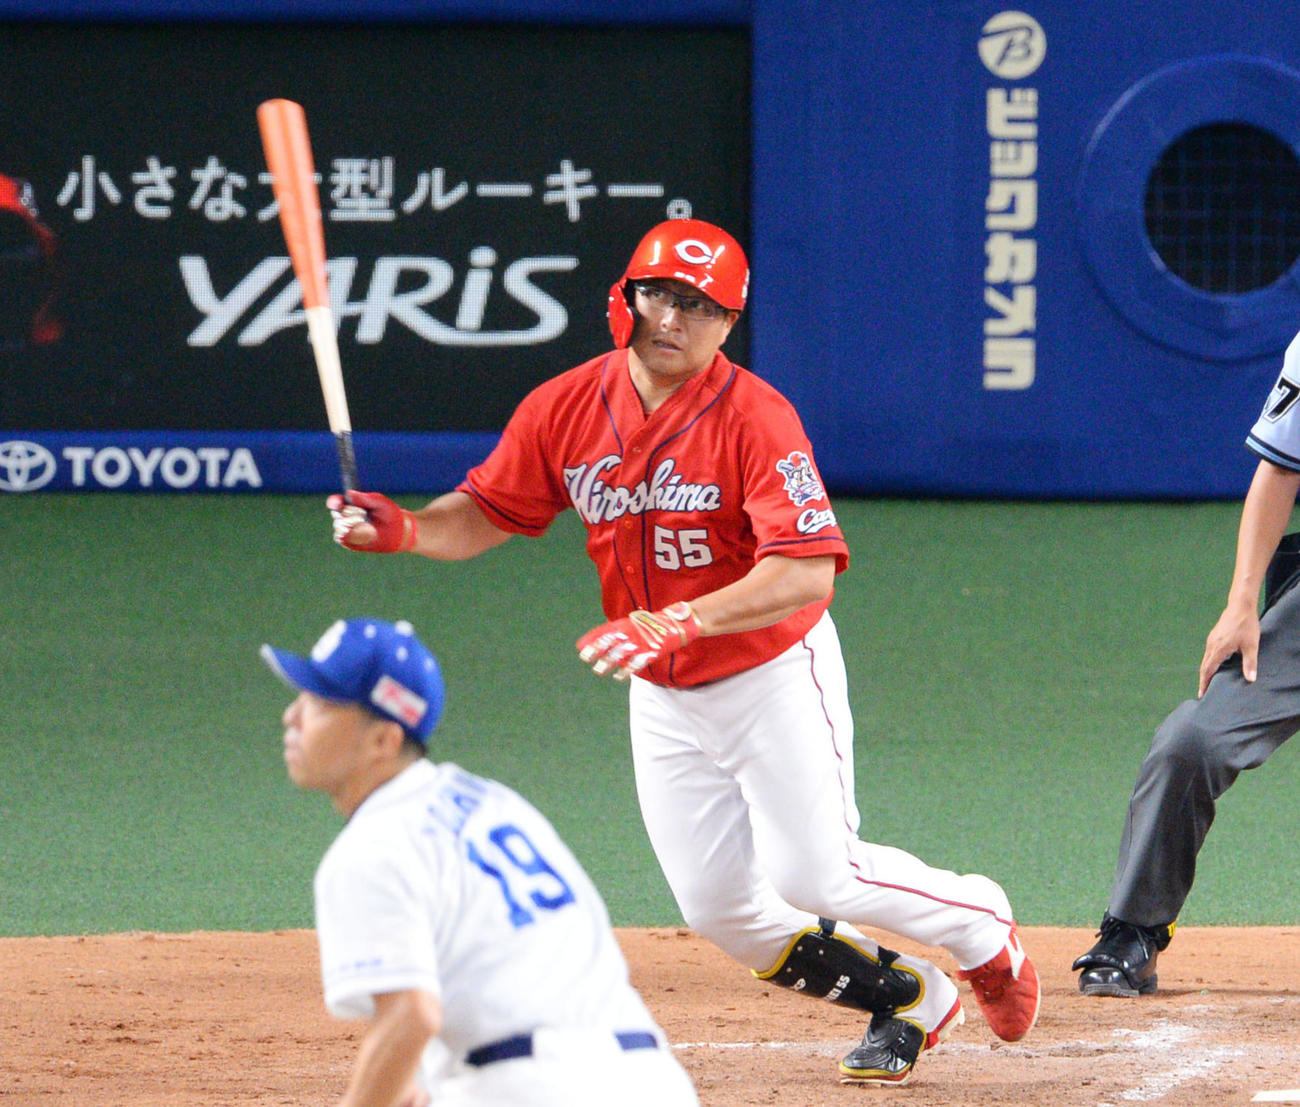 プロ野球中日対広島 4回表広島2死三塁、右前適時打を放った松山竜平(撮影・森本幸一)